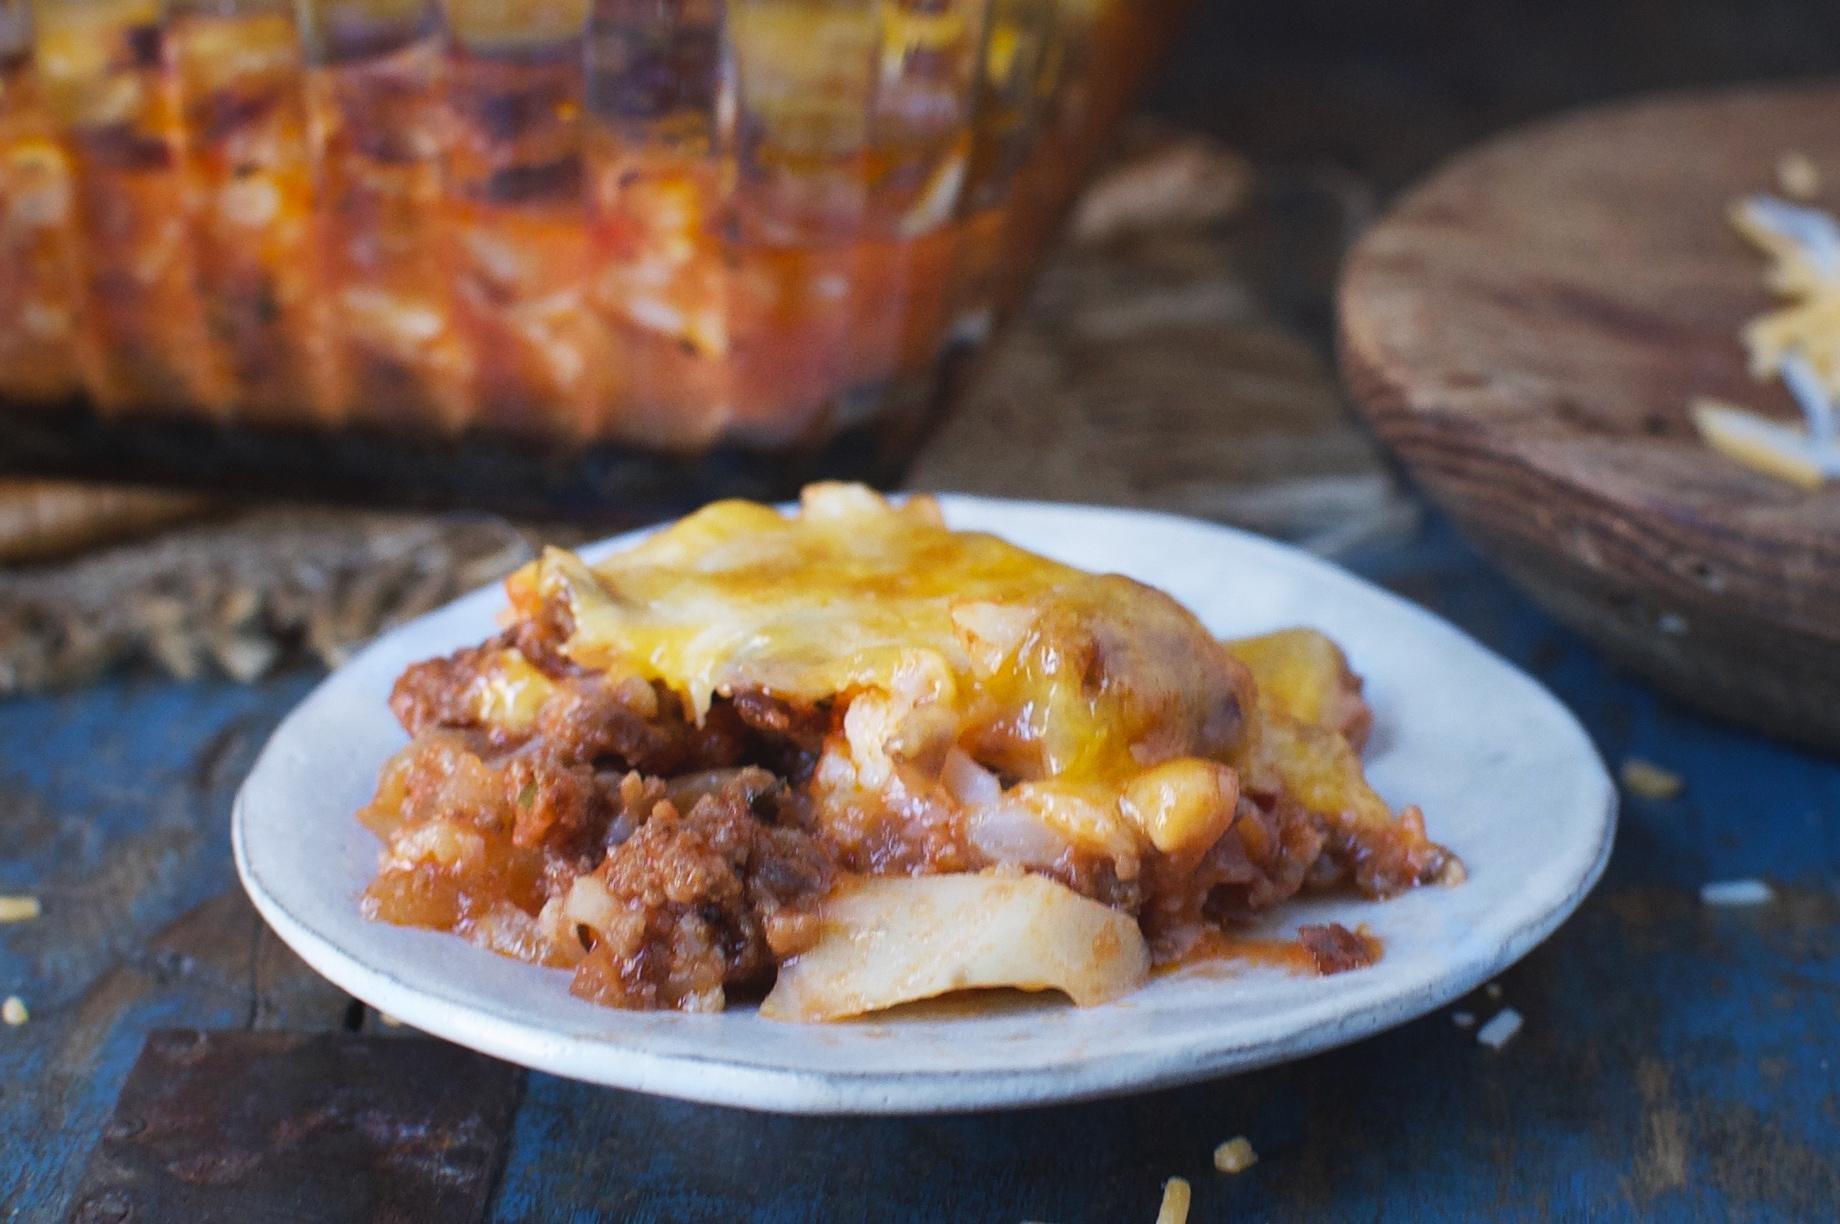 Keto-friendly Italian Ground Beef Casserole Recipe